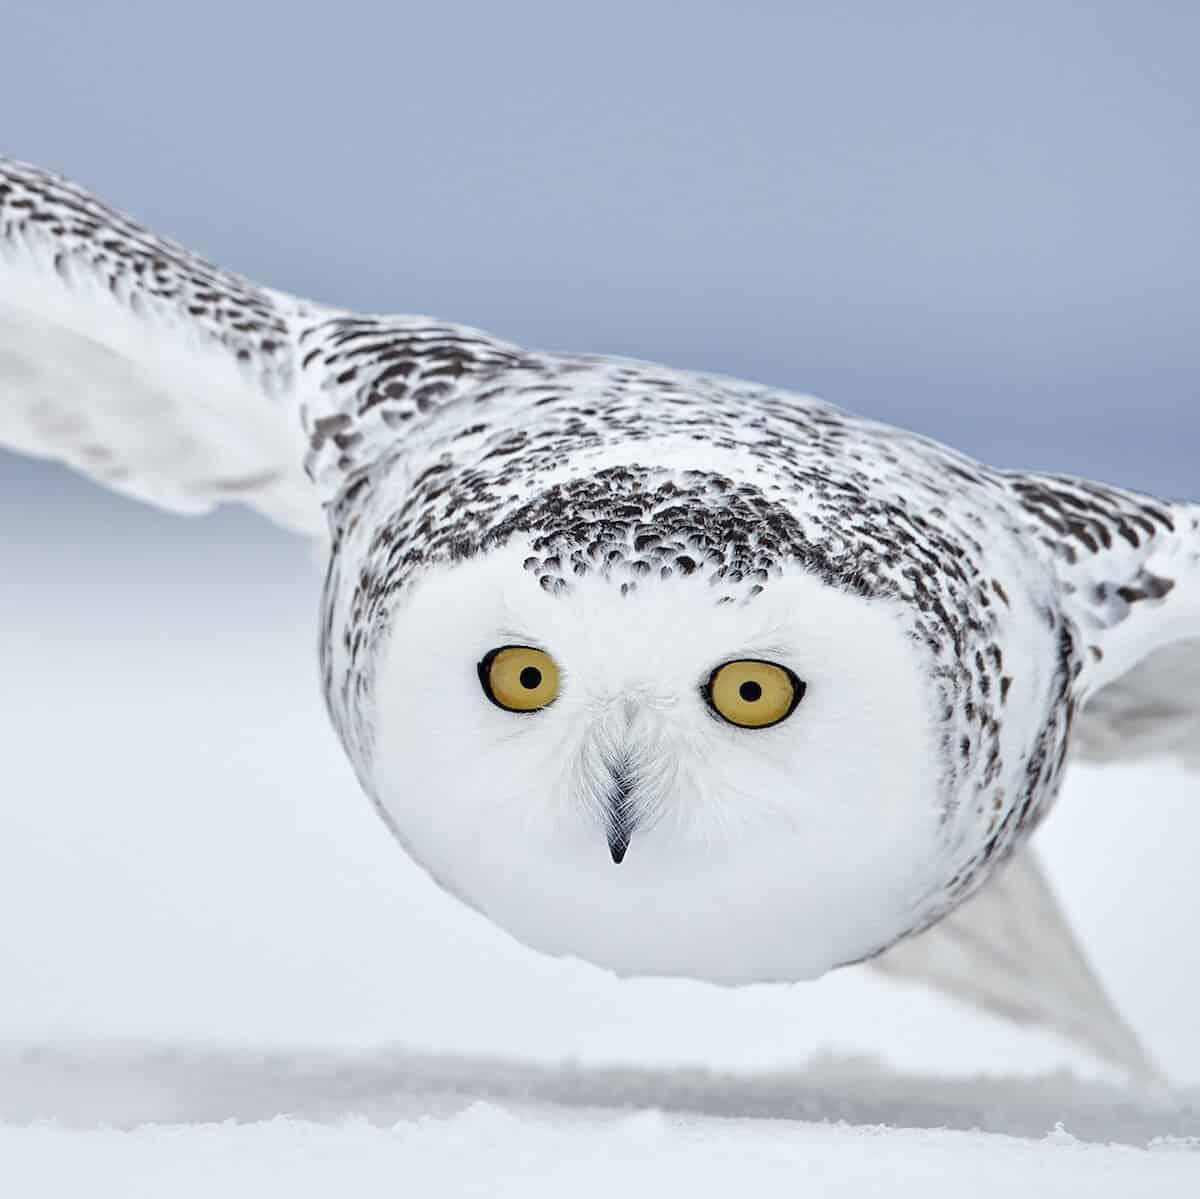 Лучшие фотографы птиц. Конкурс Bird Photographer of the Year 2018, фото 12